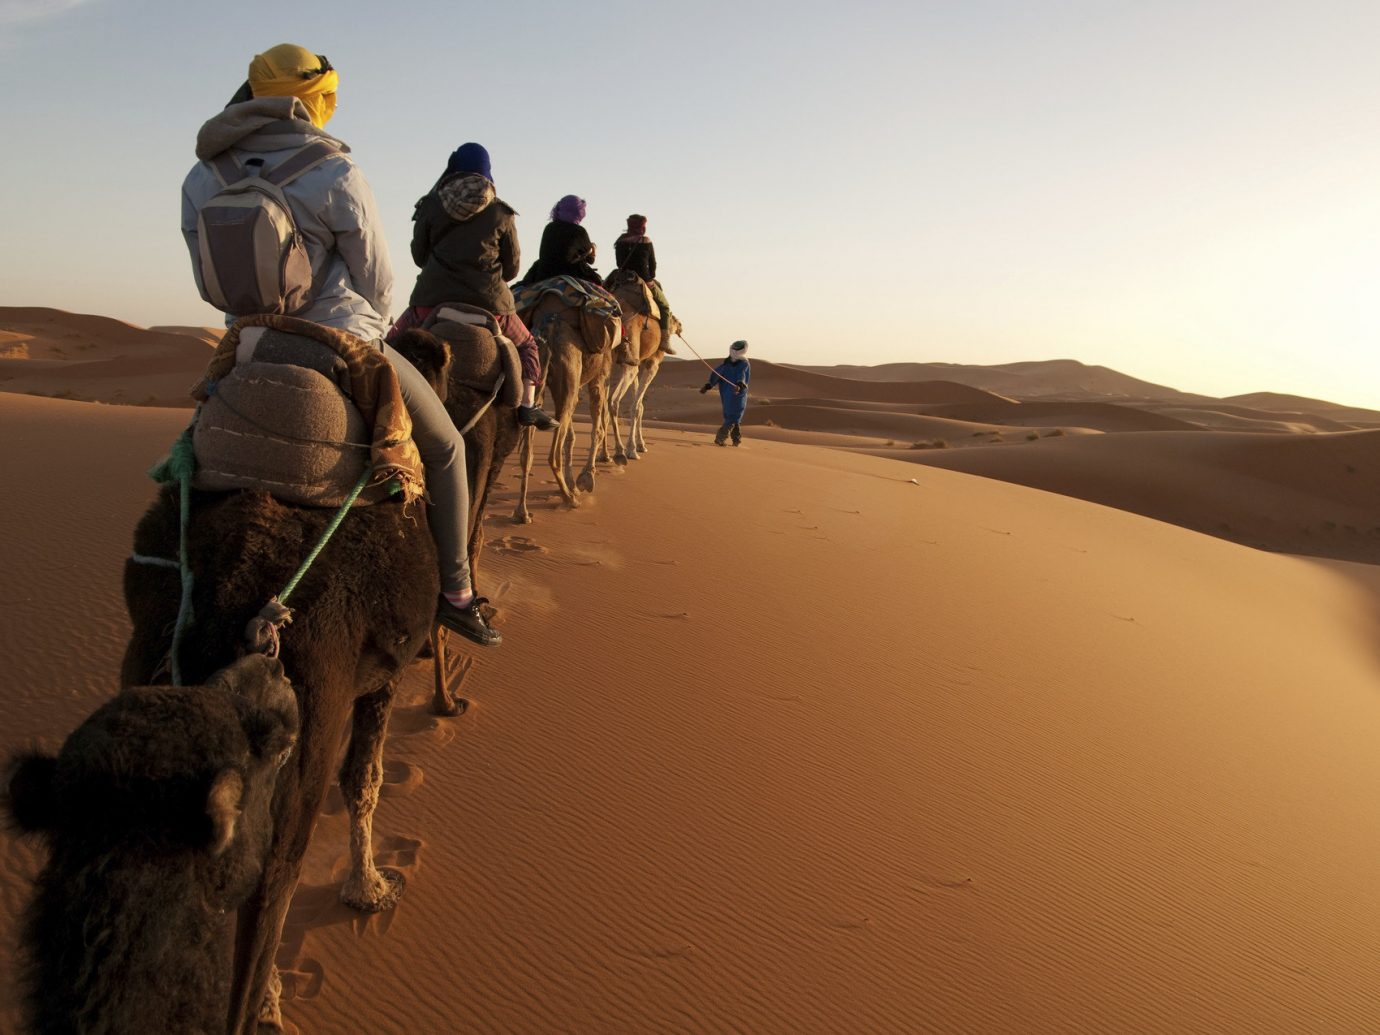 Trip Ideas sky outdoor sahara natural environment landform erg Camel Desert geographical feature riding aeolian landform landscape sand wadi camel like mammal Nature camel racing people arabian camel